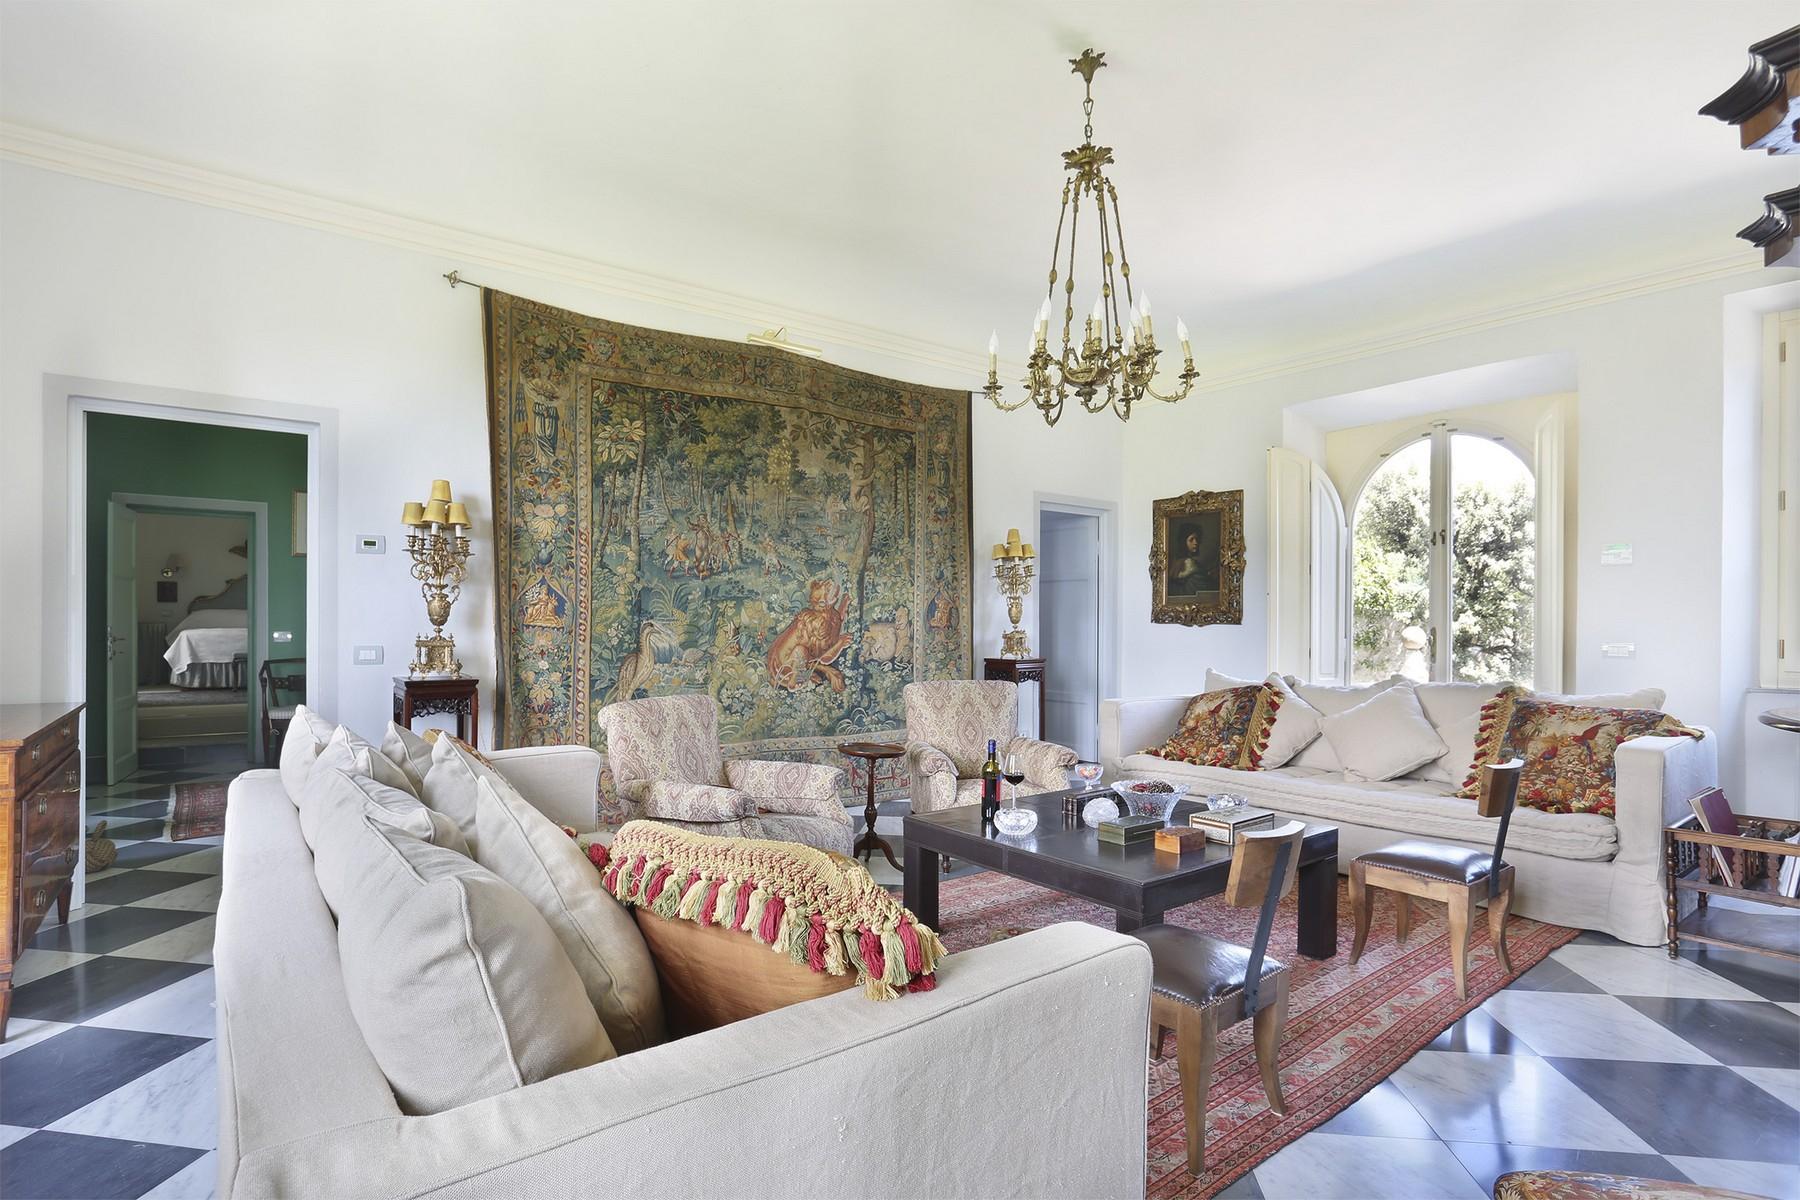 Villa in Vendita a Lucca: 5 locali, 735 mq - Foto 22